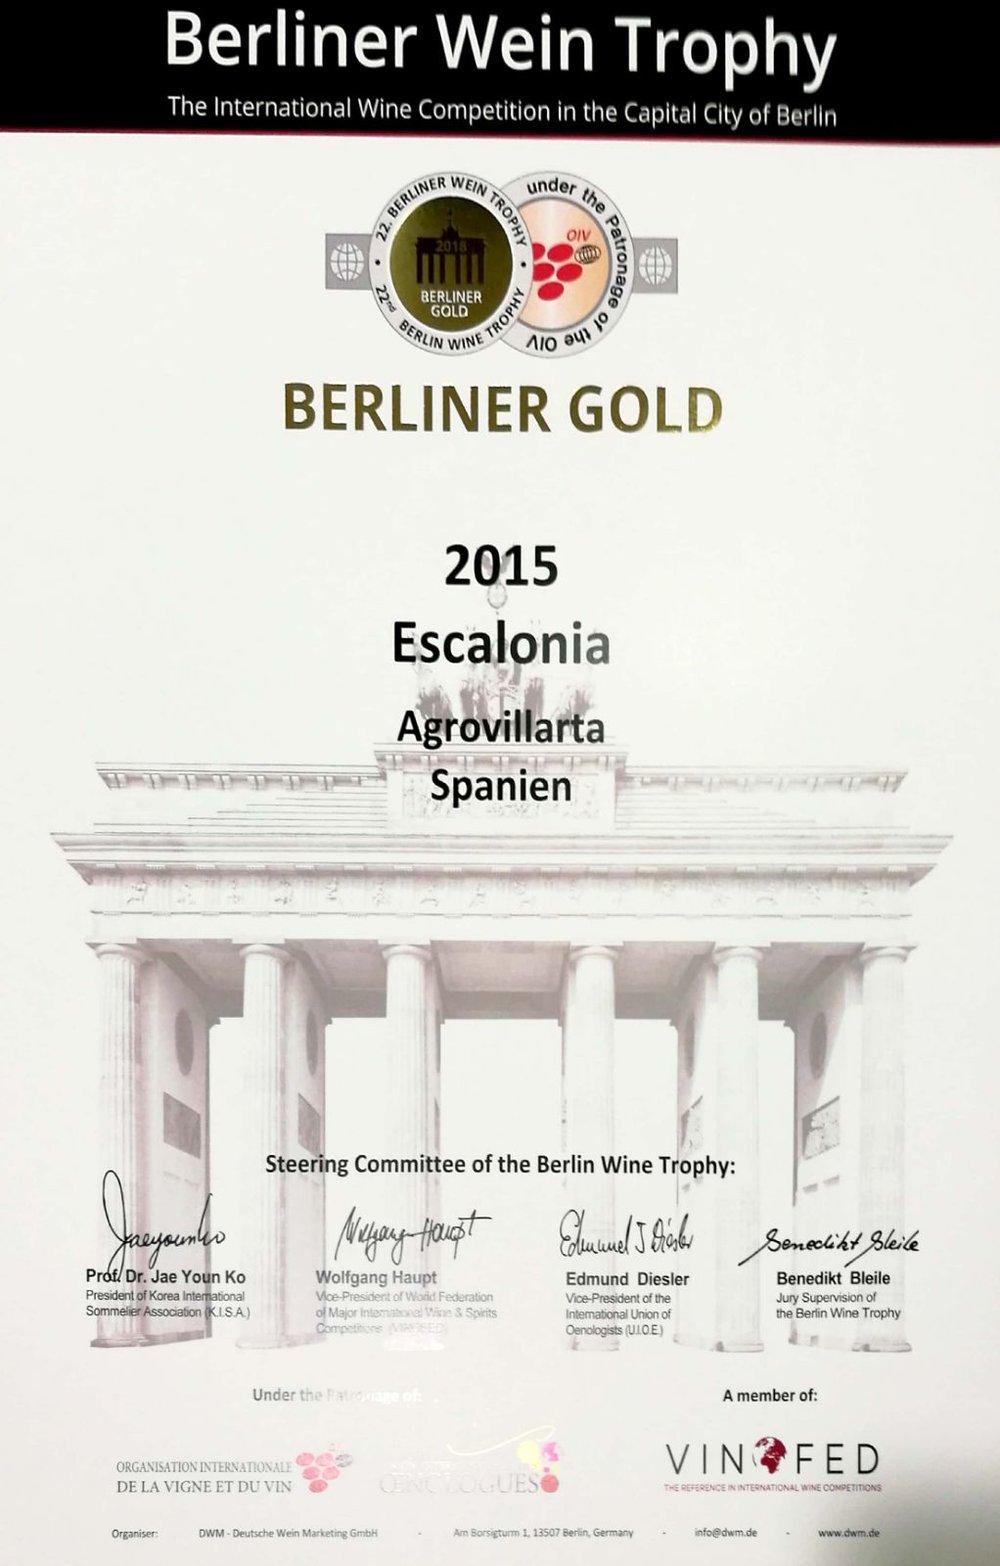 berliner.gold.2015.escalonia.jpeg